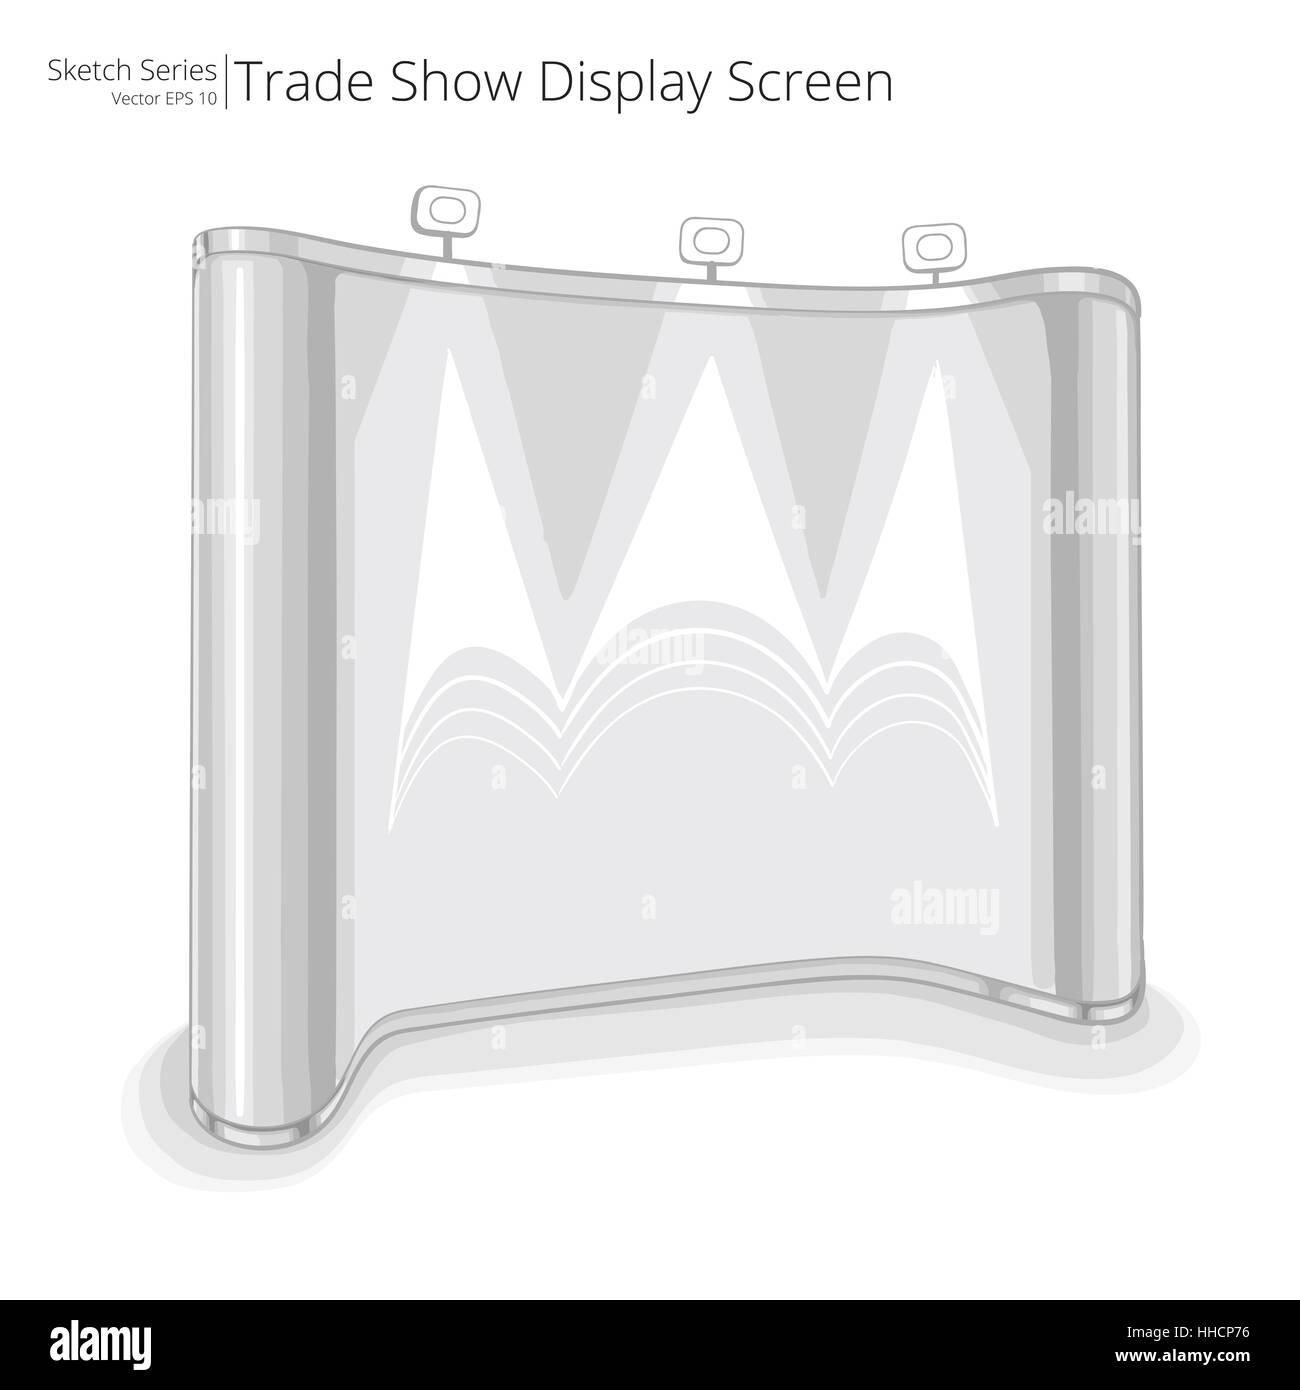 Exhibition Stand Sketch : Kkmoon cm inch durable art artist wood wooden easel sketch